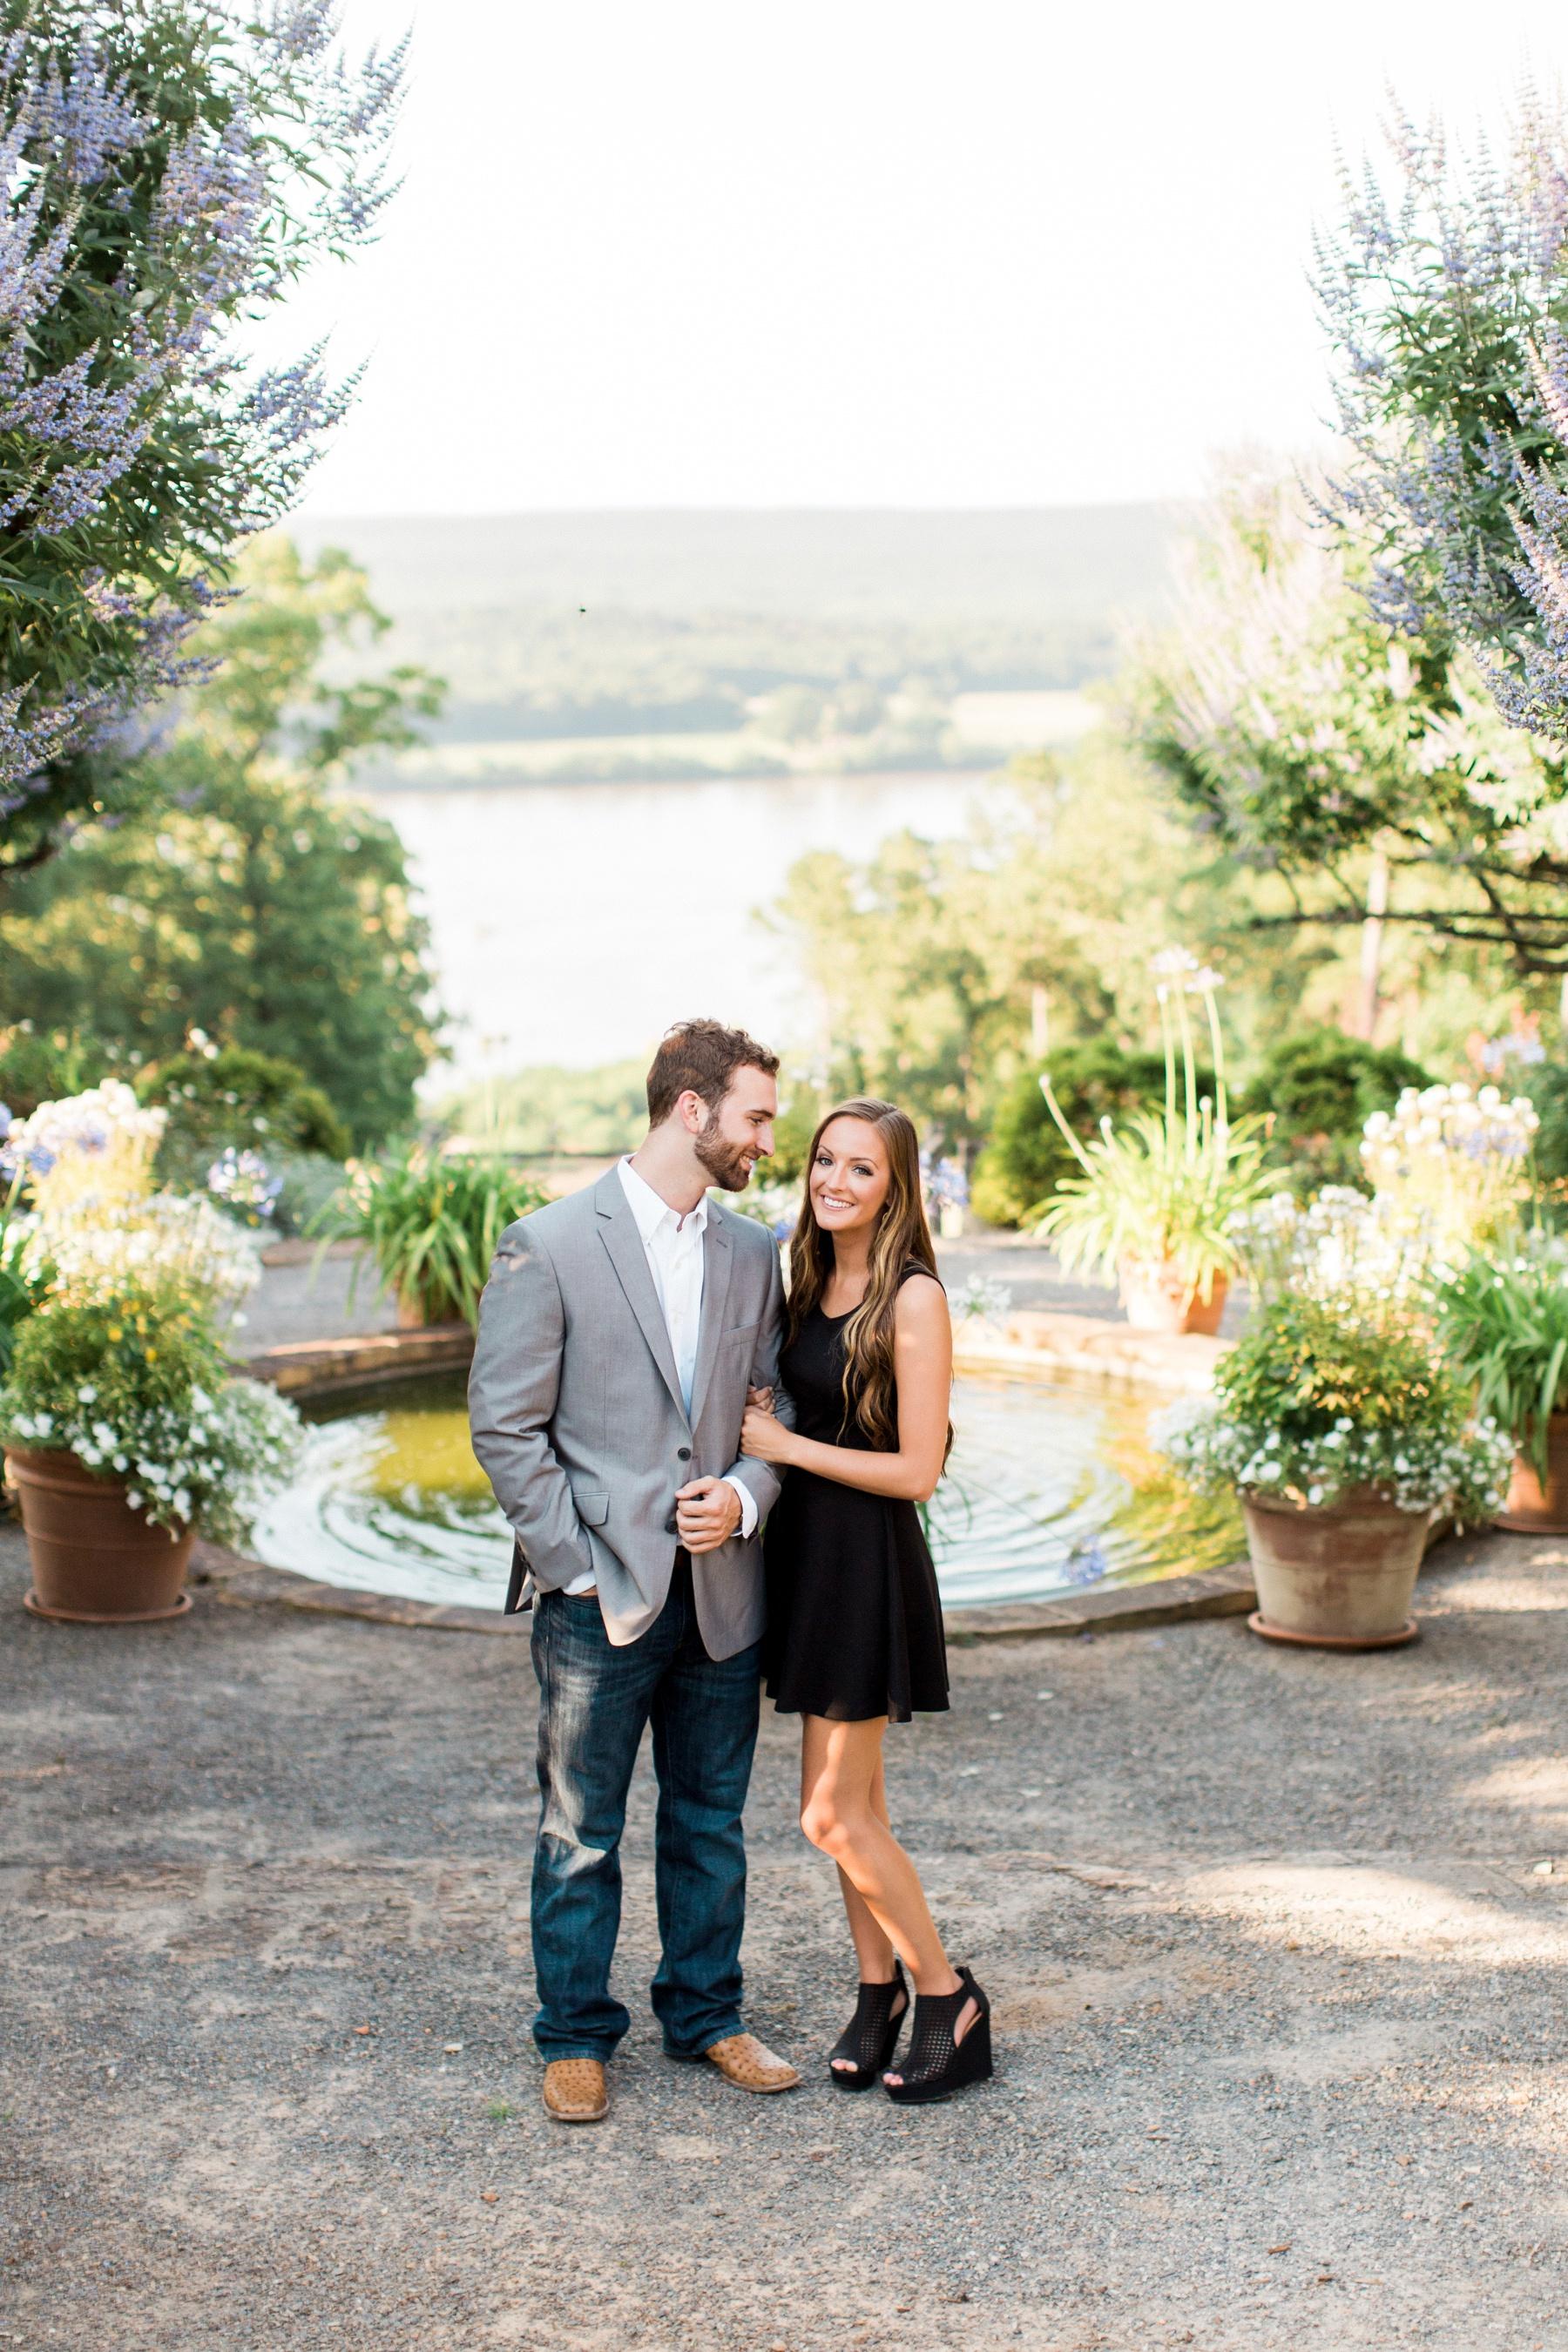 Moss Mountain Farms Wedding Arkansas_0138.jpg